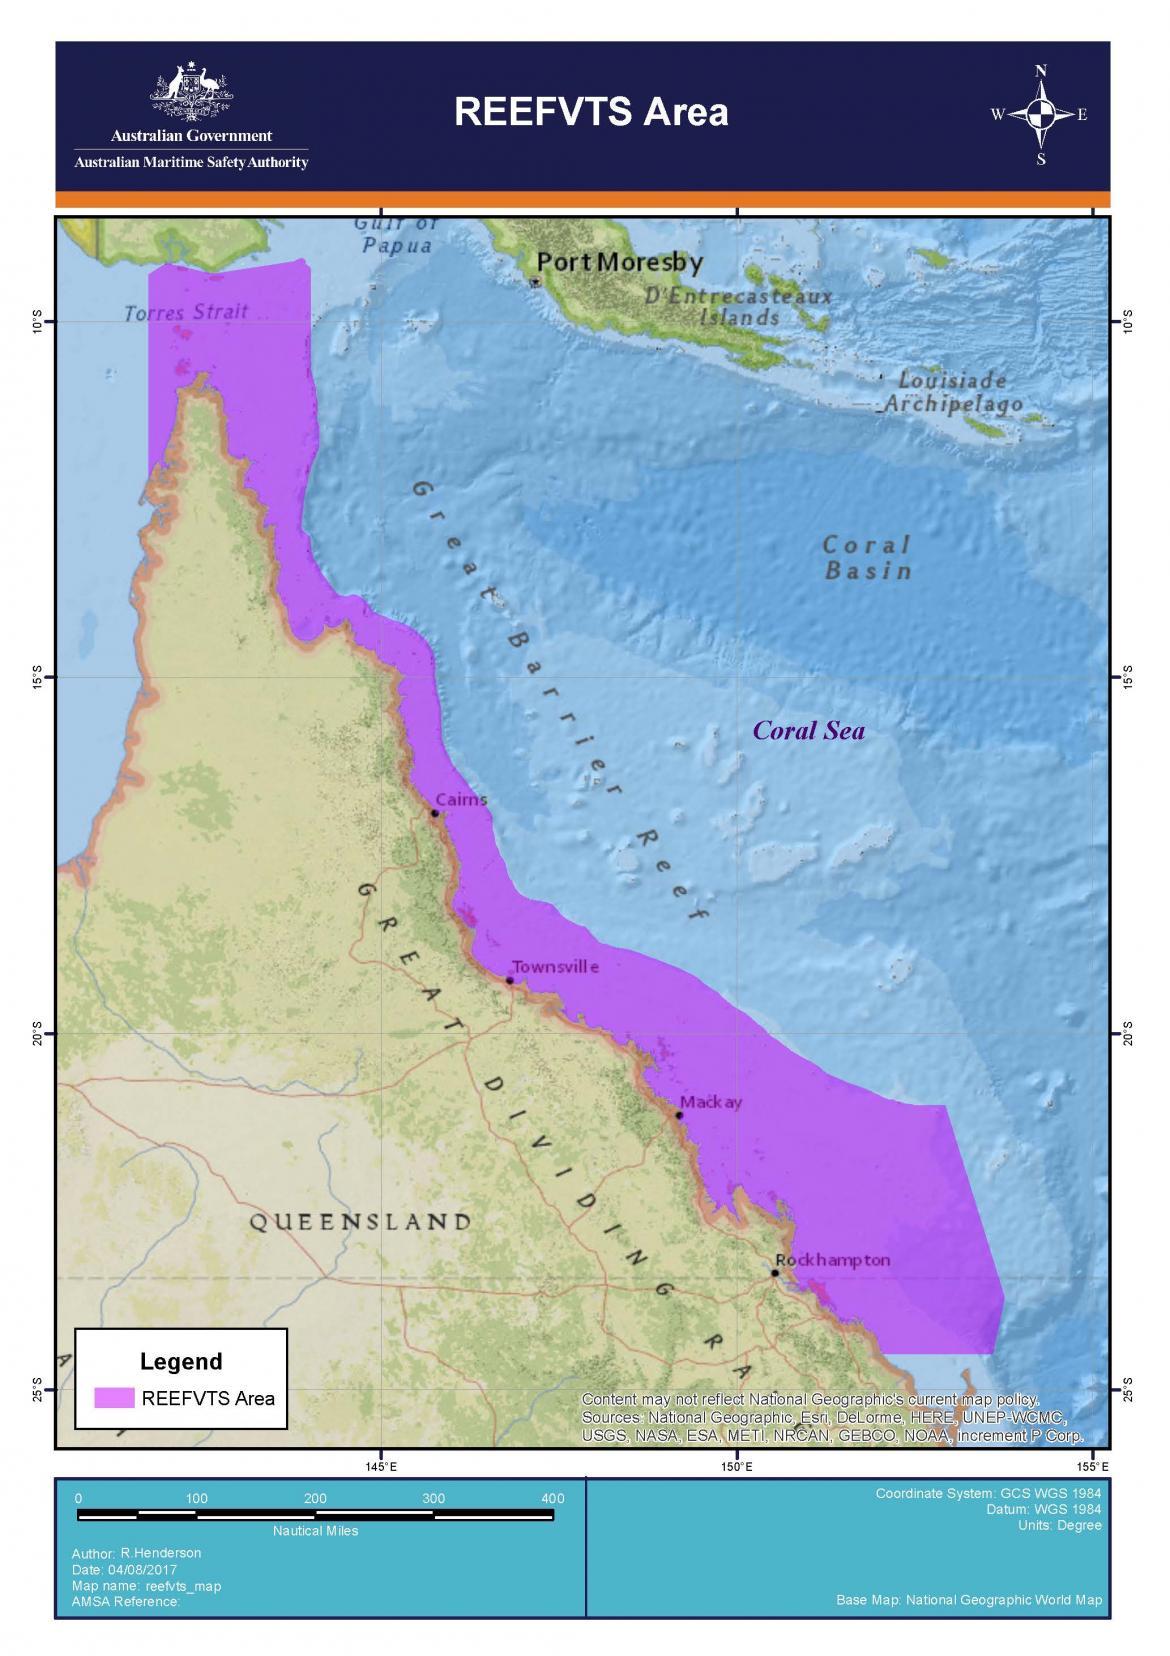 Barrier Reef Australia Map.2017 8 Reefvts Map Jpg Australian Maritime Safety Authority